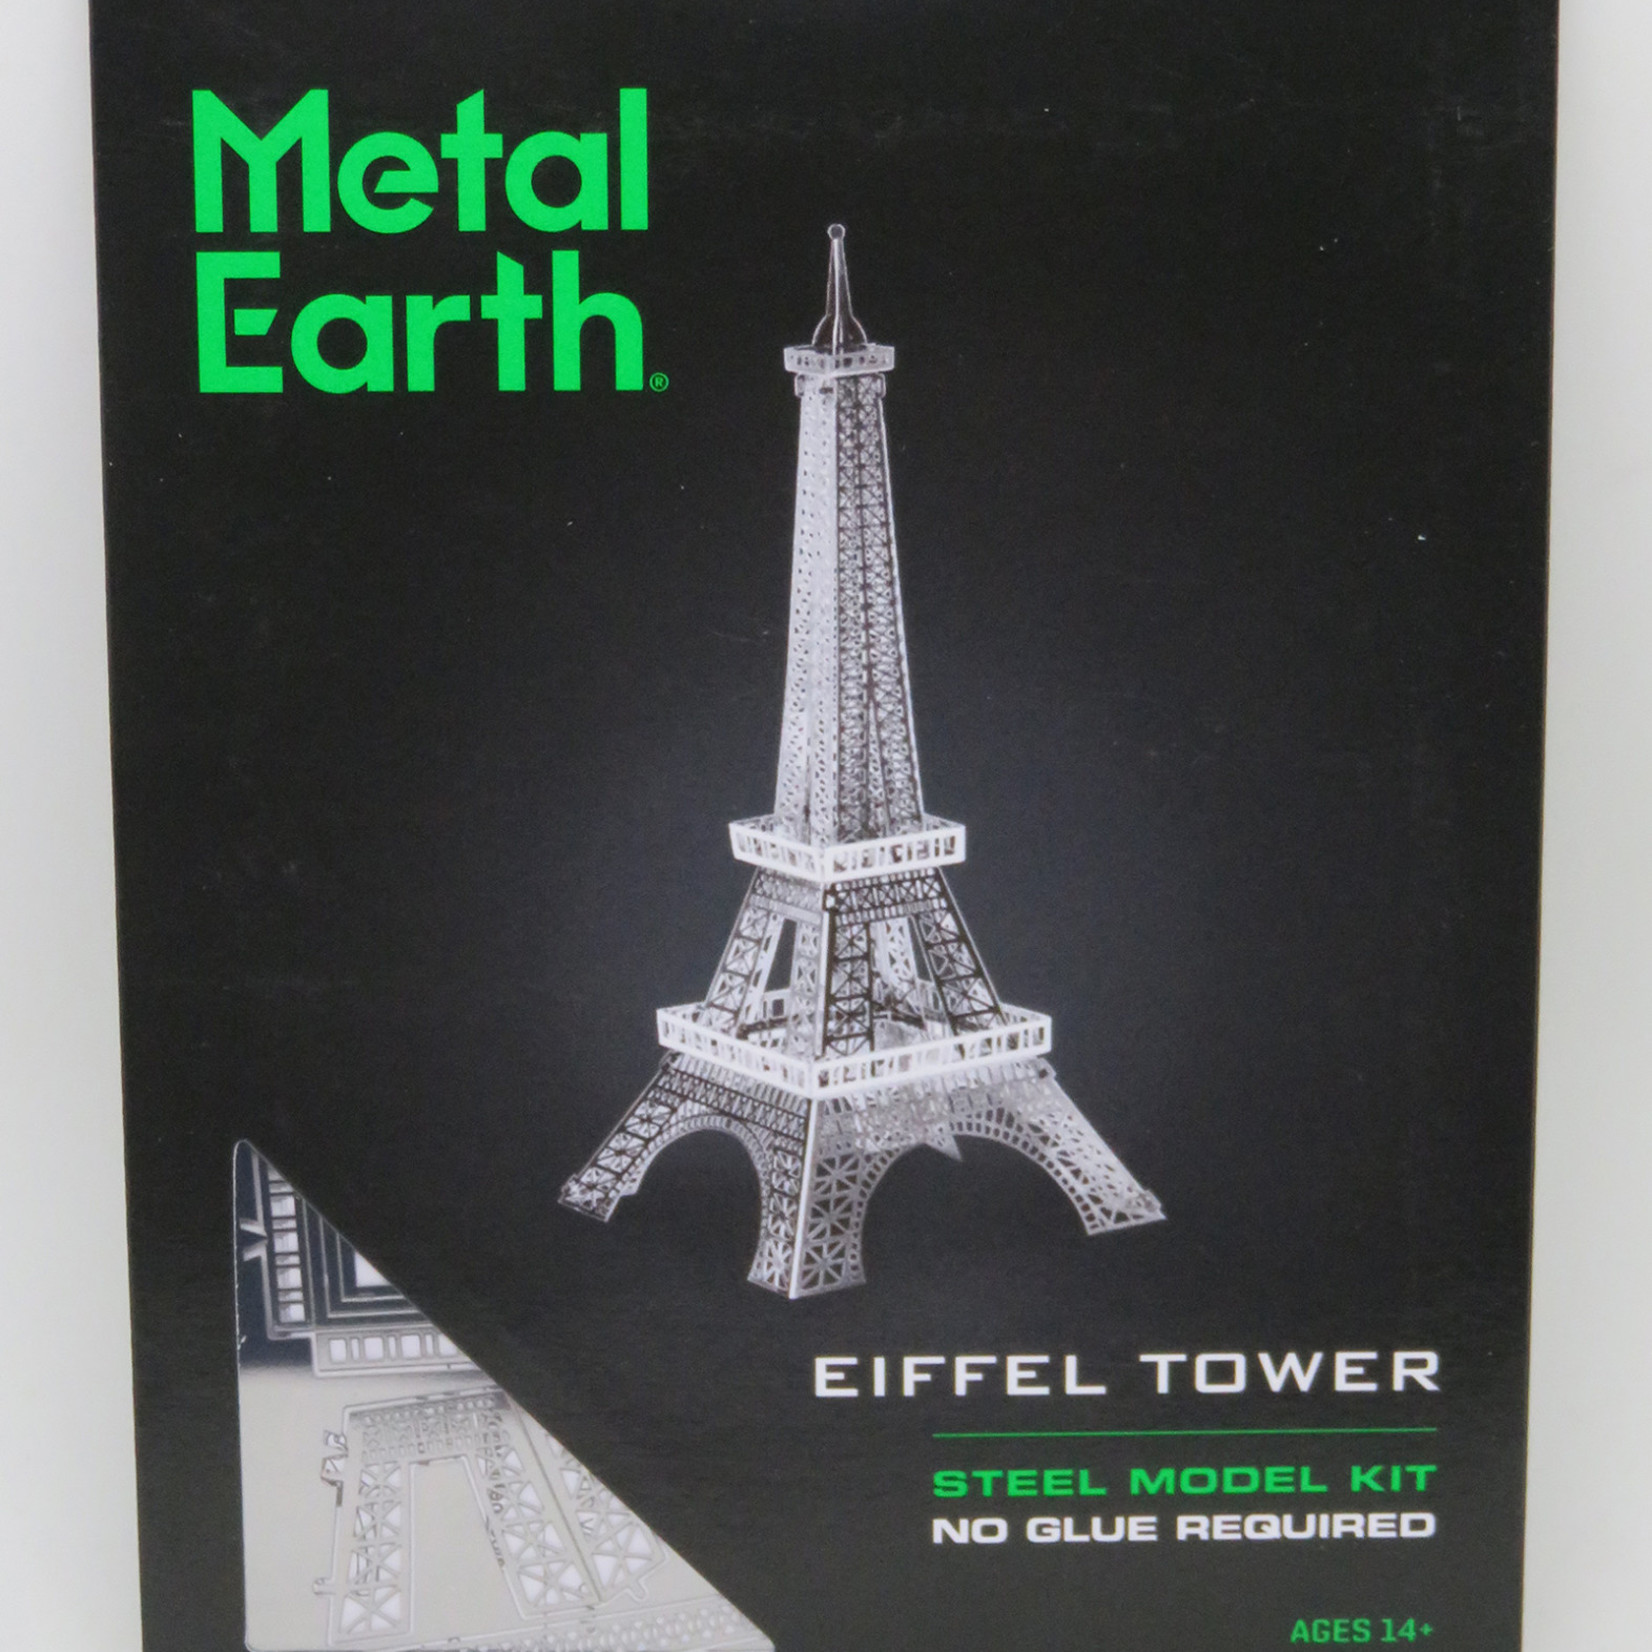 Metal Earth: Eiffel Tower